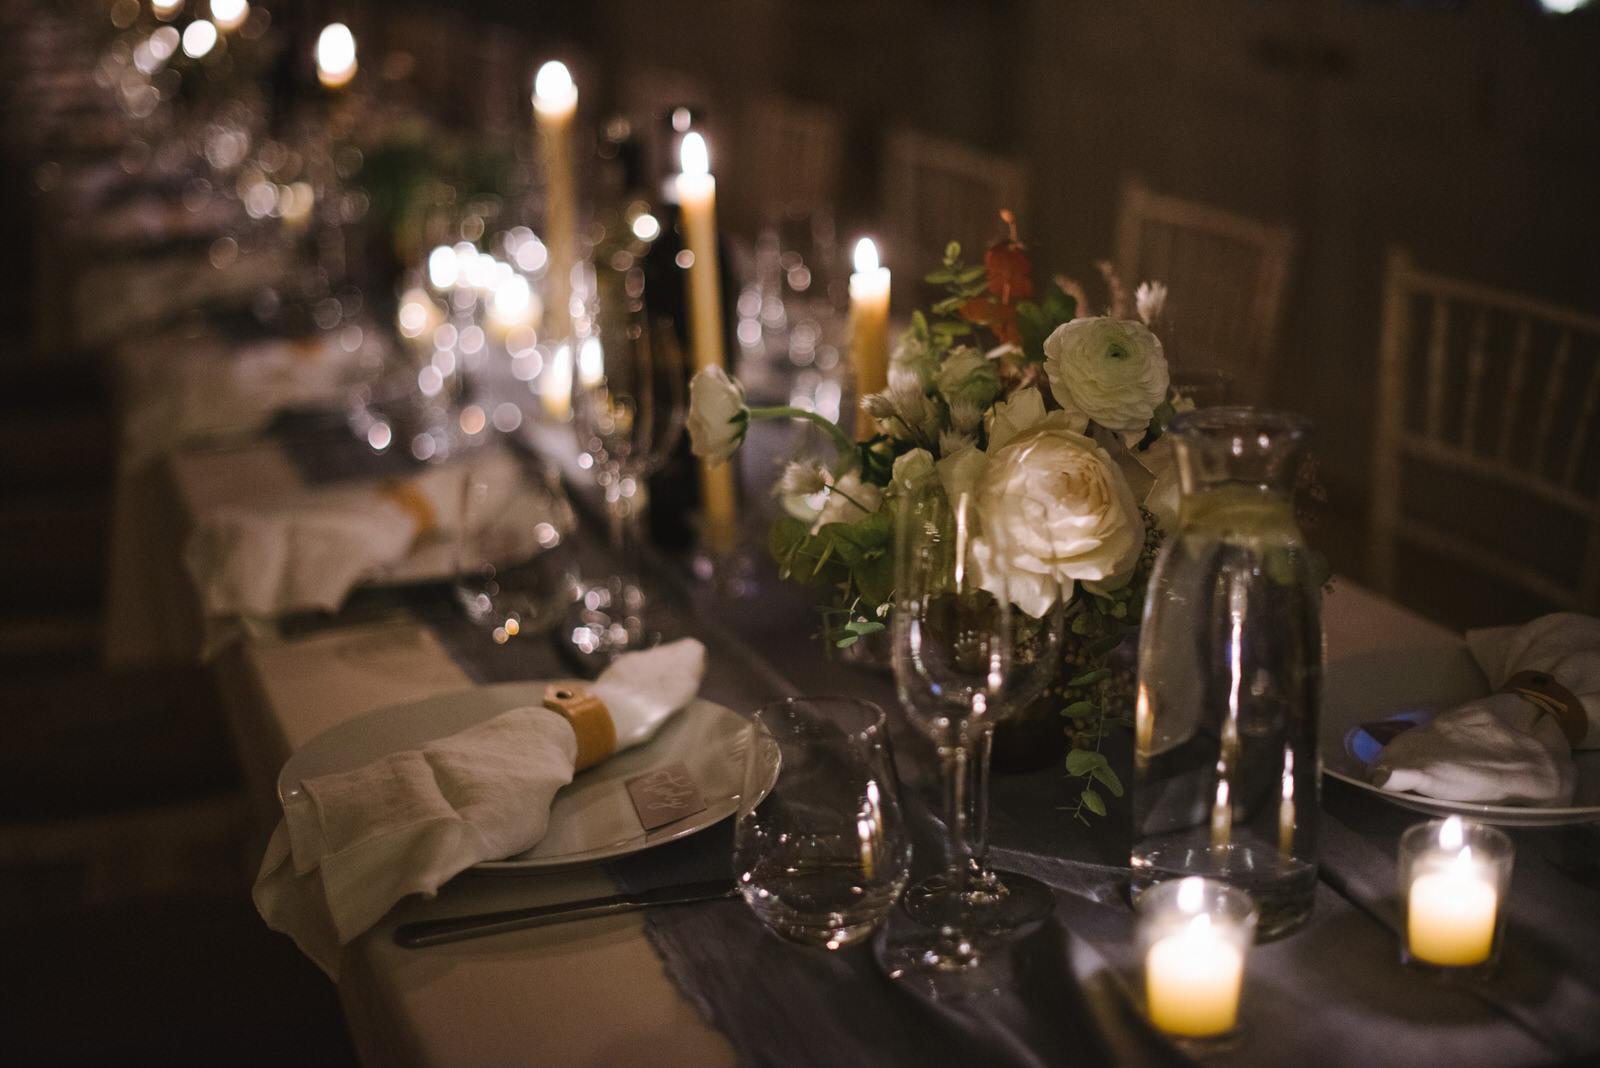 035-COLSTOUN-HOUSE-WEDDING-ALTERNATIVE-WEDDING-PHOTOGRAPHER-GLASGOW-WEDDING-PHOTOGRAPHER-STYLISH-SCOTTISH-WEDDING.JPG